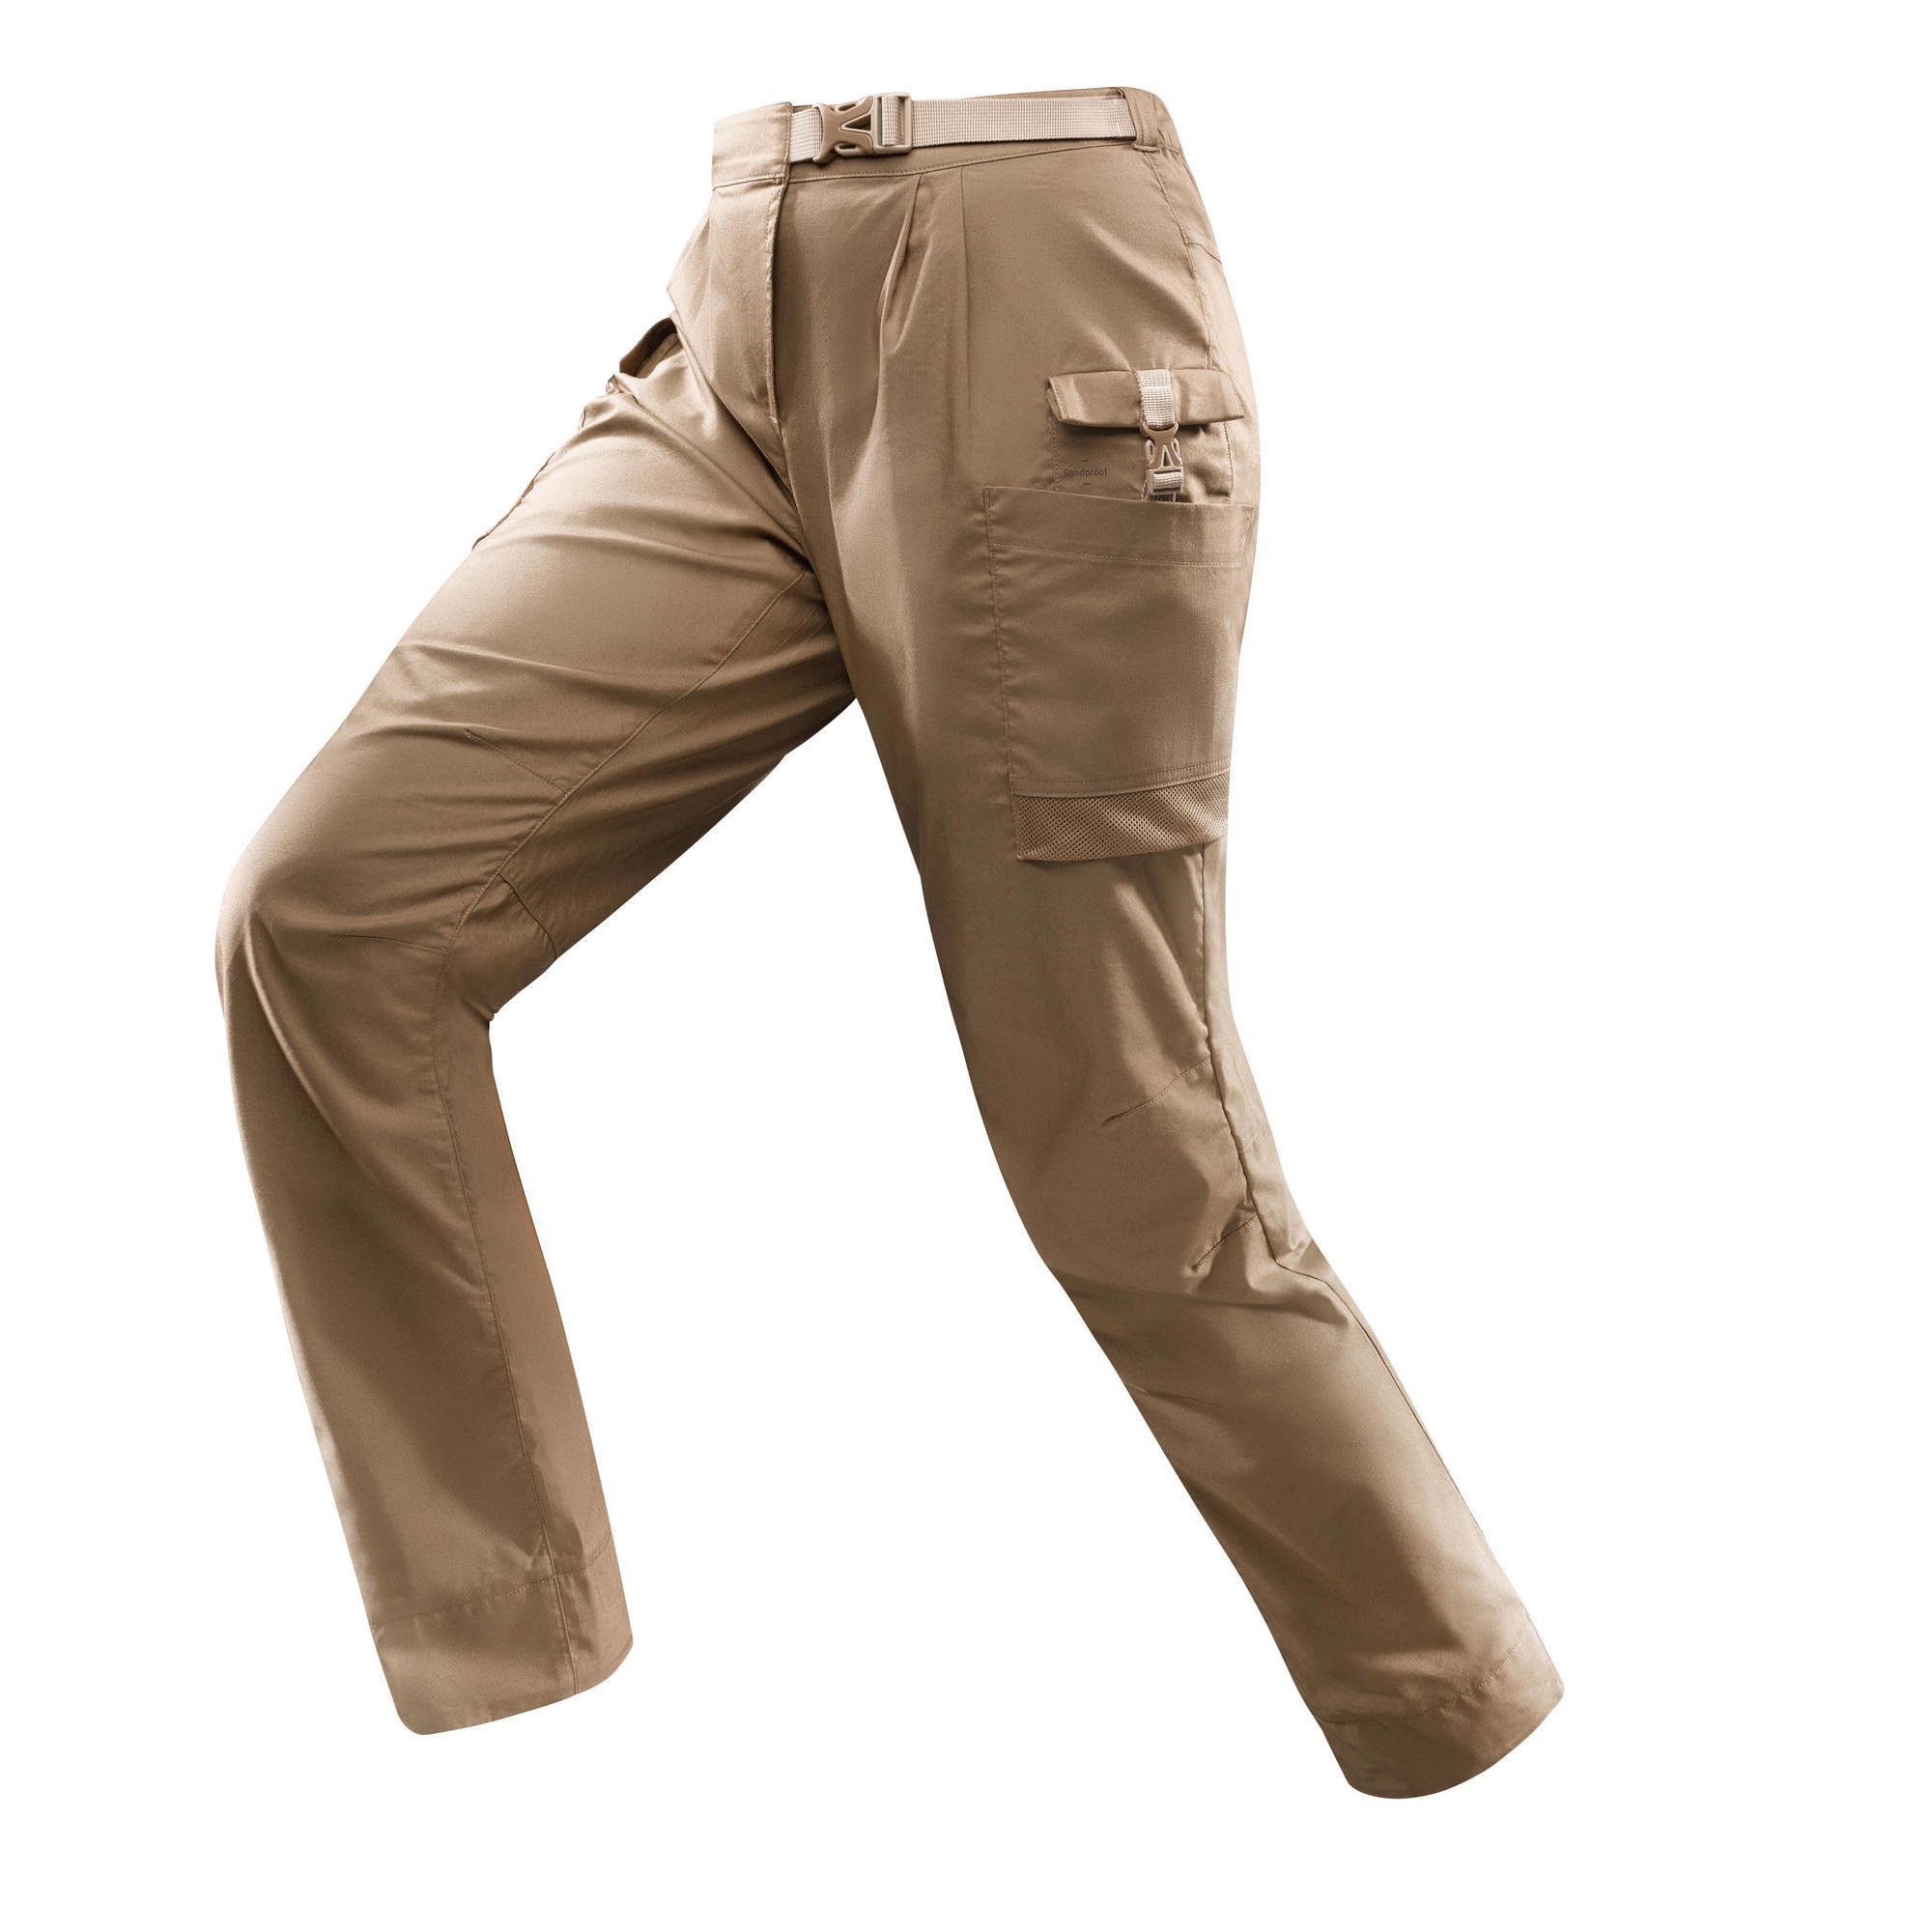 Trekkinghose Desert 500 Damen braun | Sportbekleidung > Sporthosen > Trekkinghosen | Braun | Forclaz